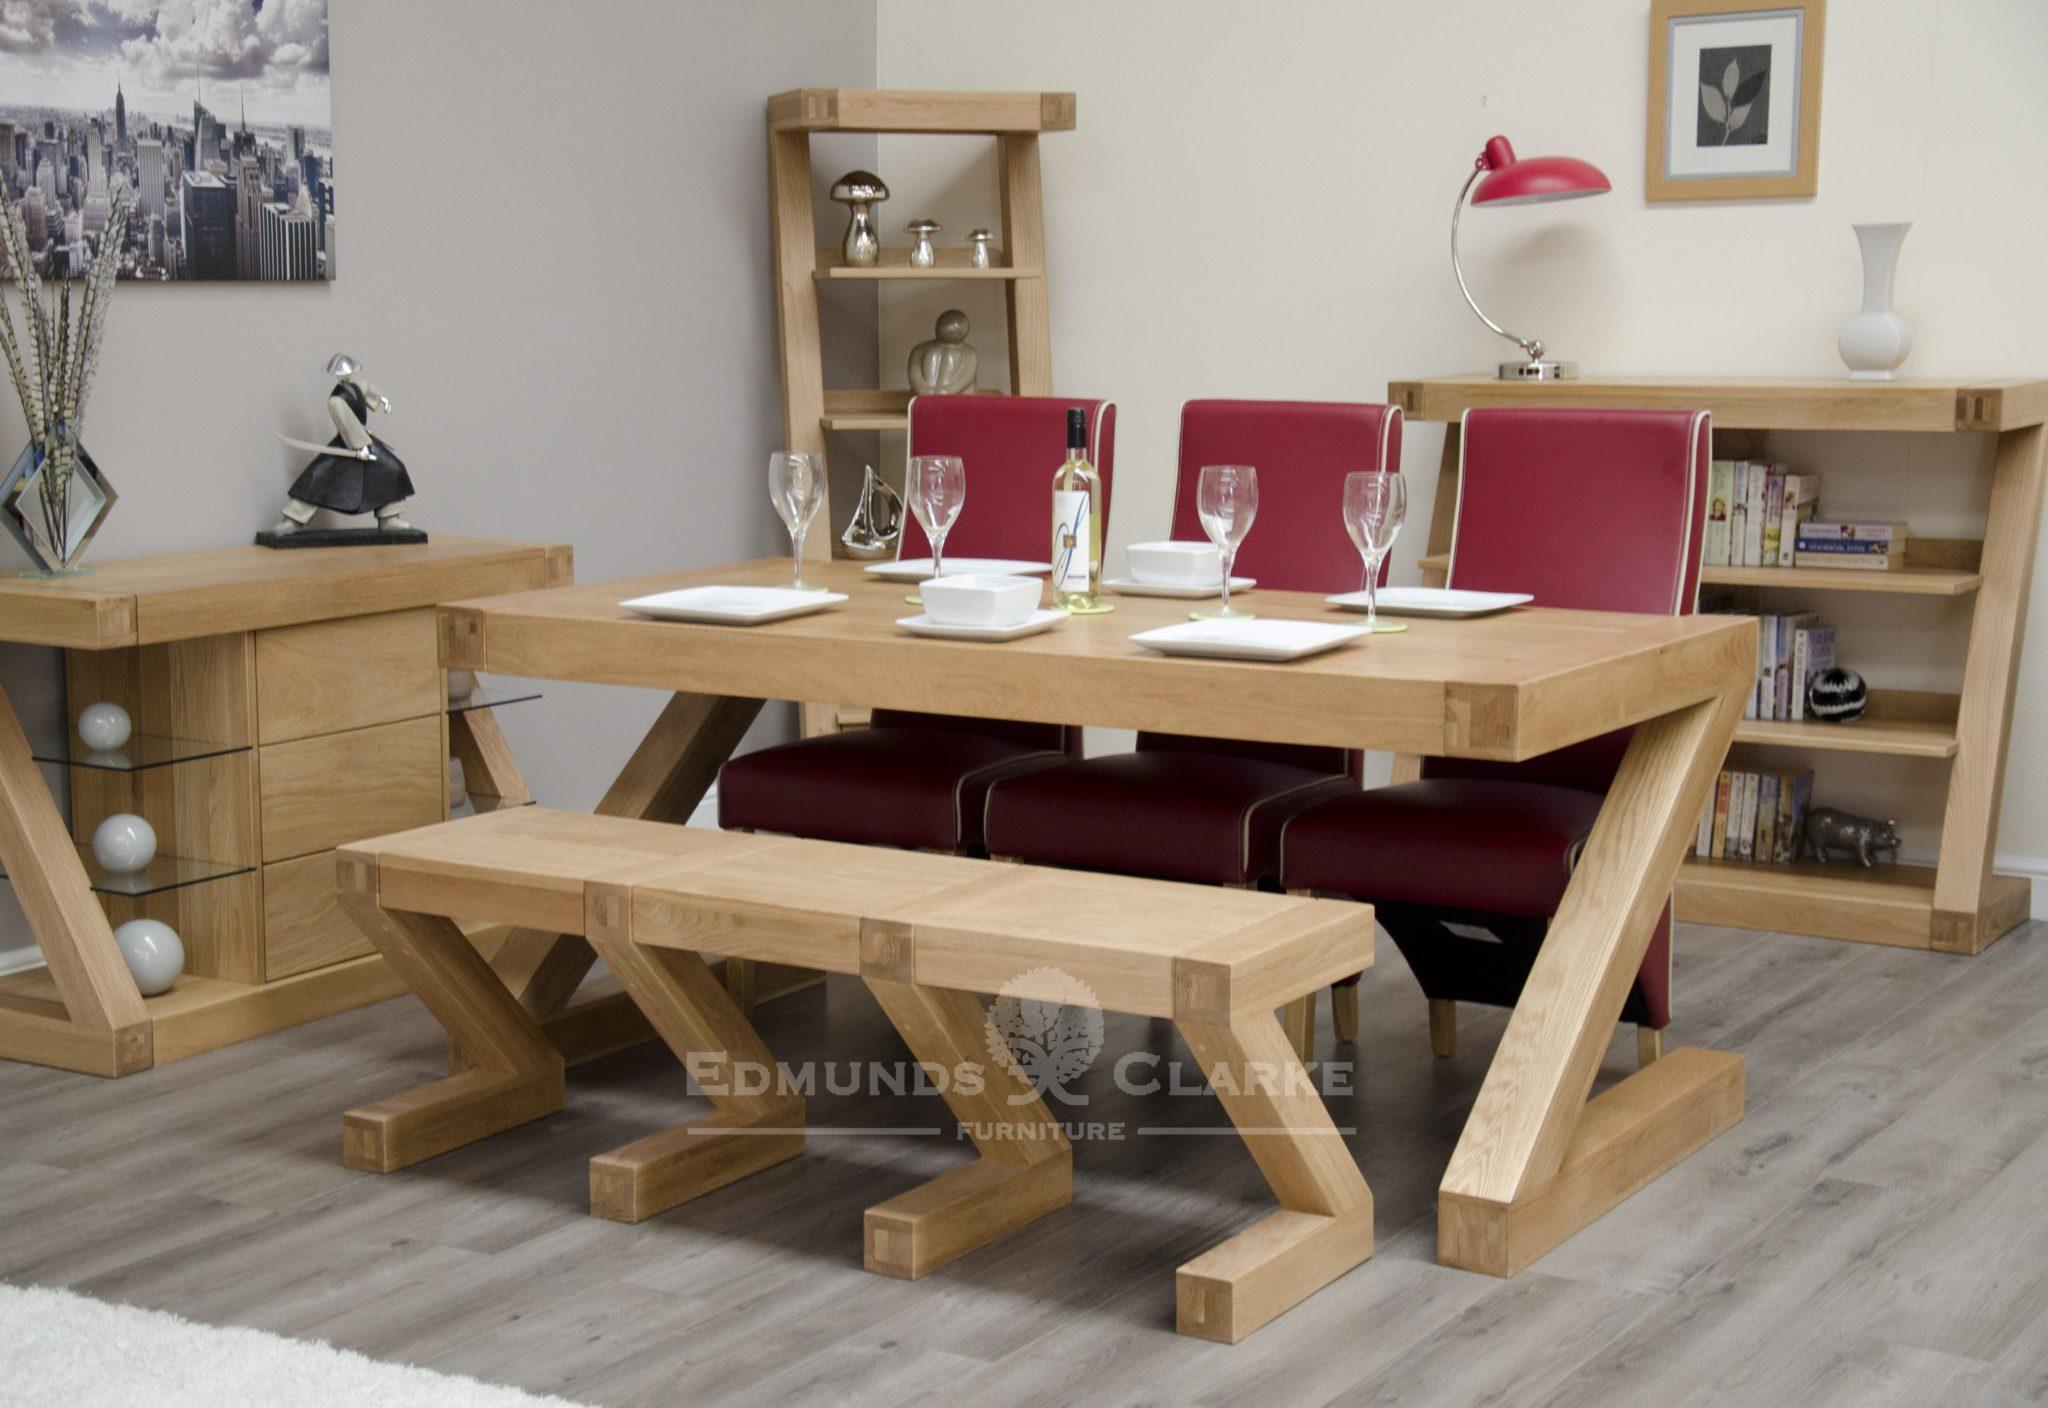 Solid oak large Z style bench